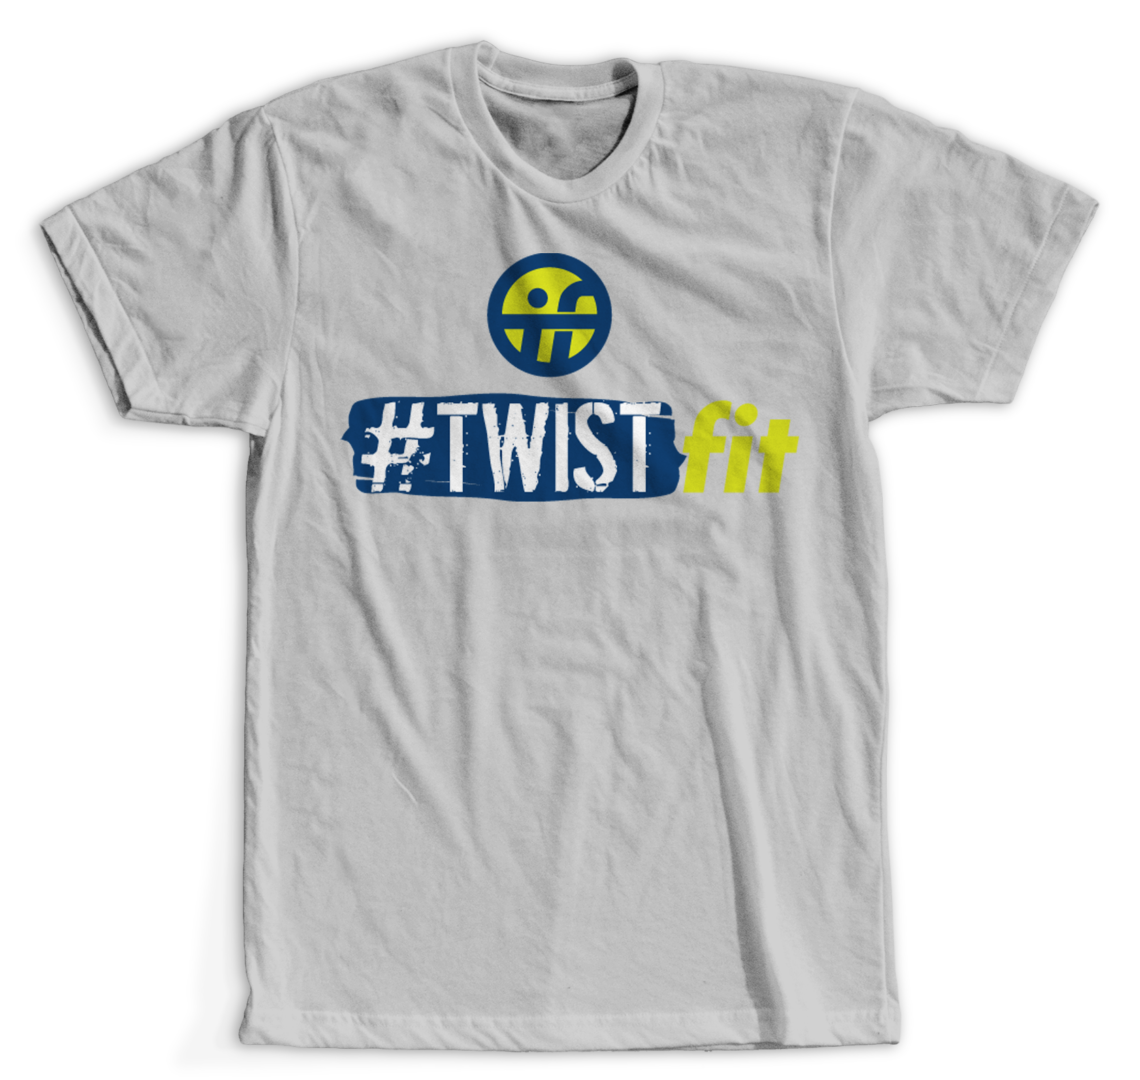 TwistFit Grey Tee